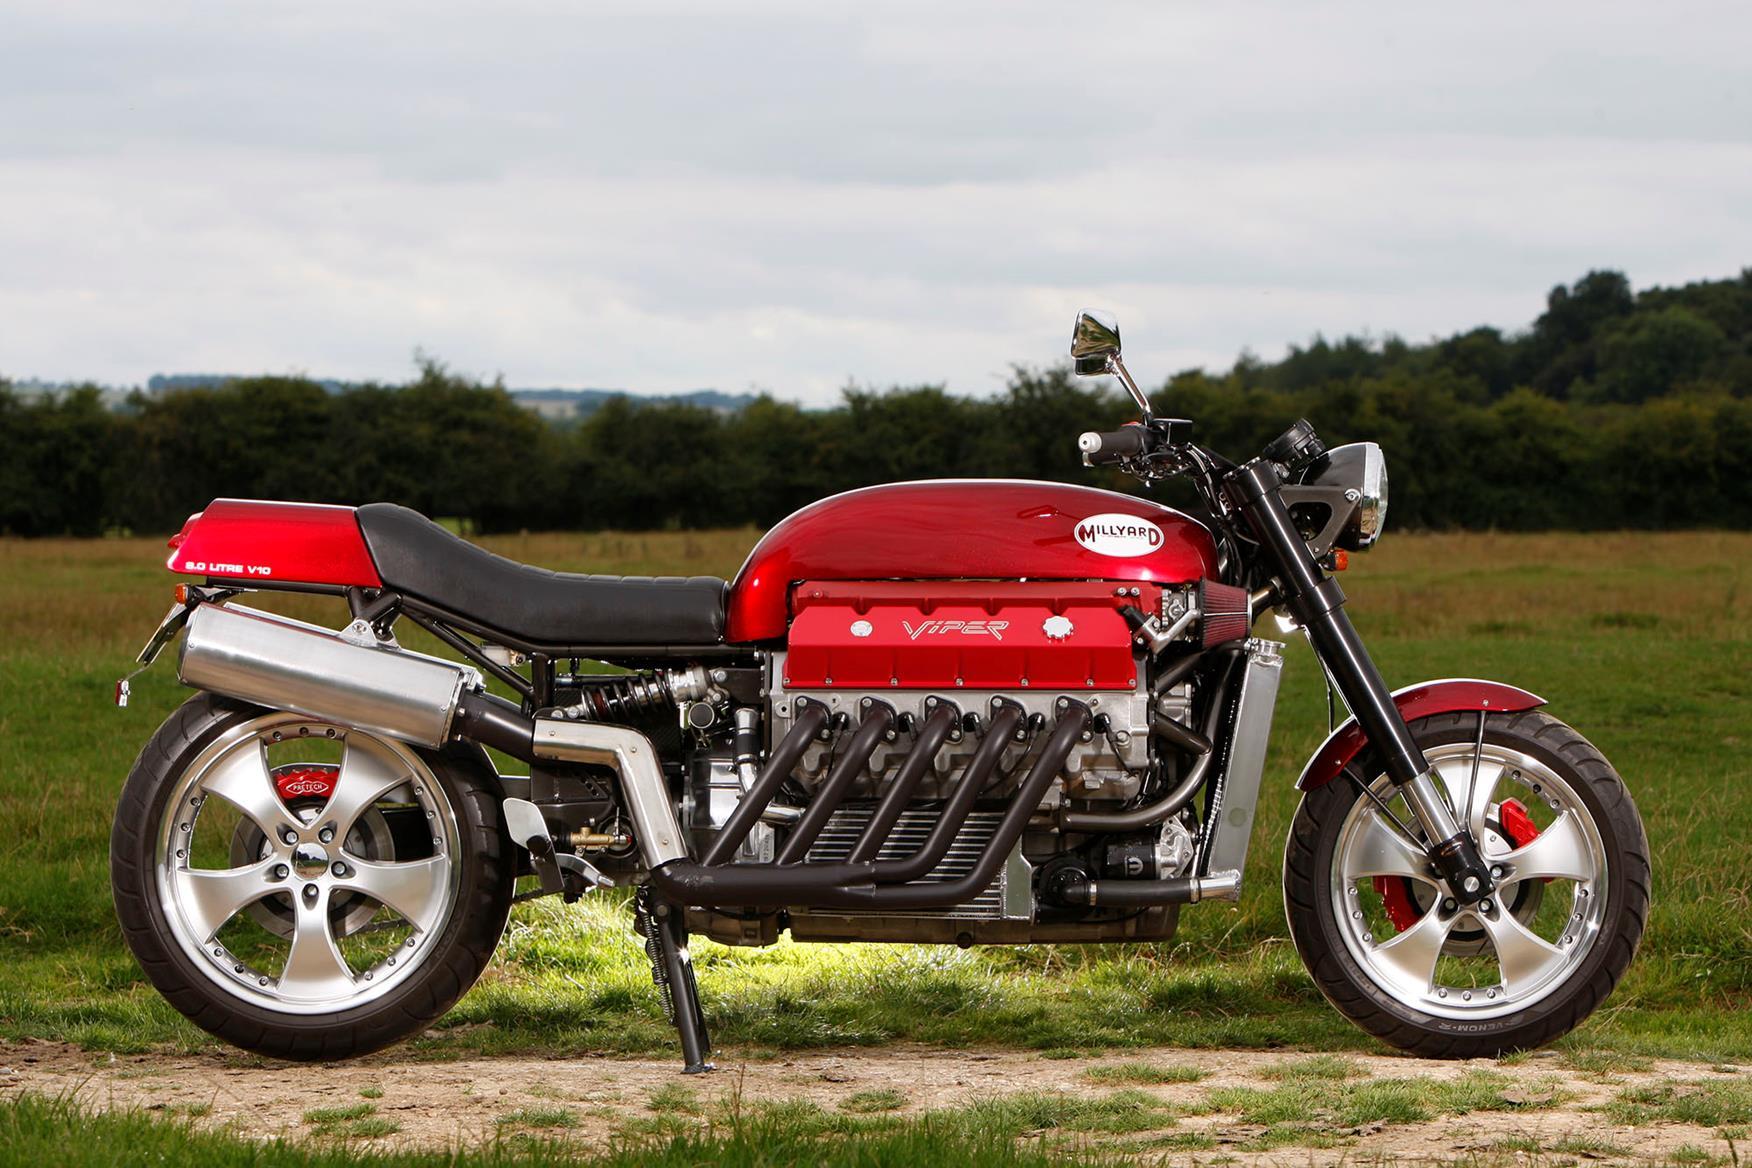 Allen Millyard V10 Viper bike